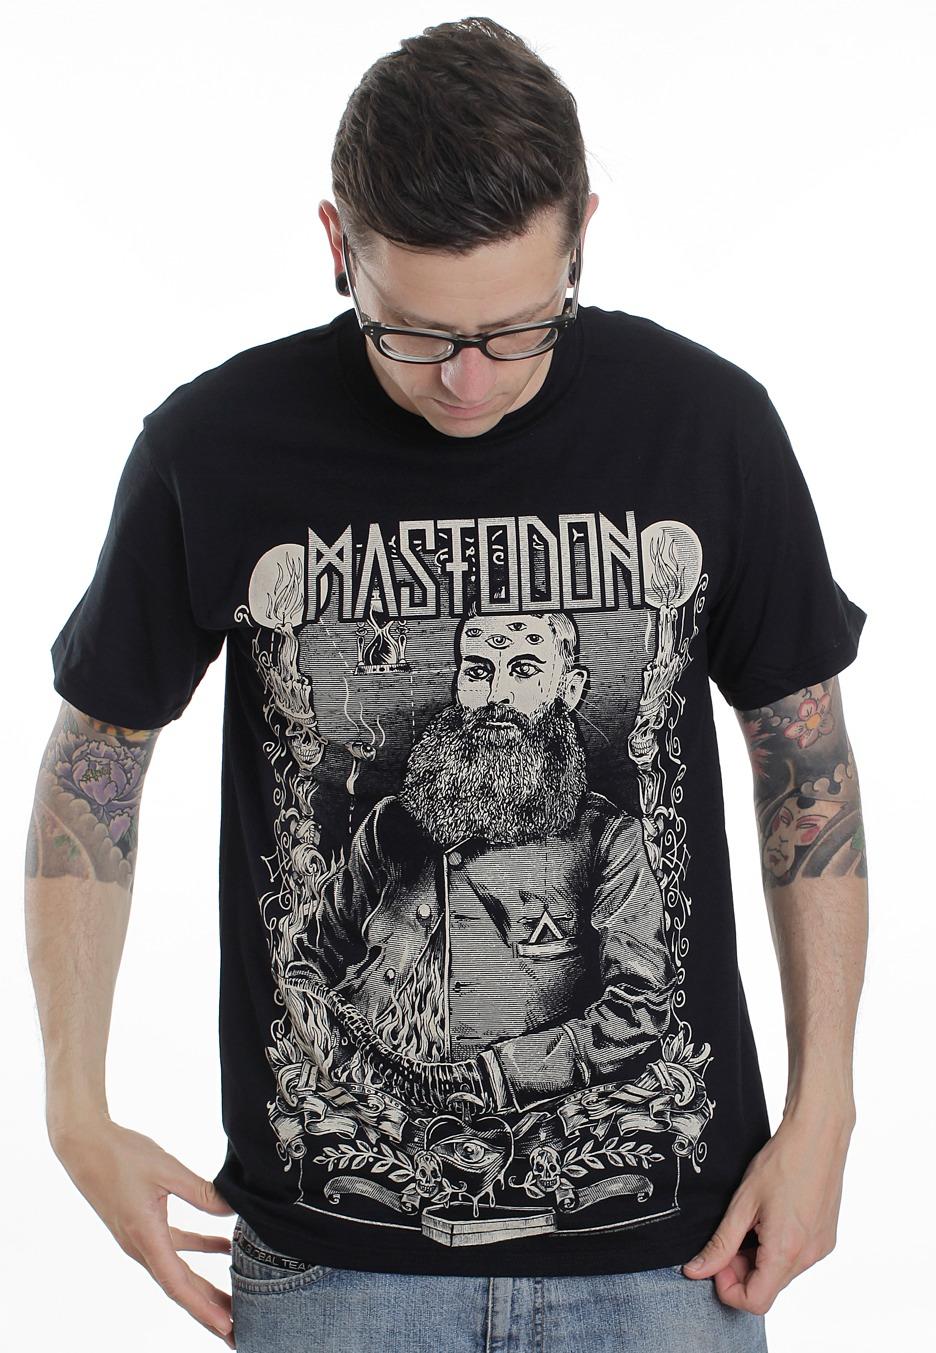 d1aadf321 Mastodon - Beard - T-Shirt - Impericon.com UK